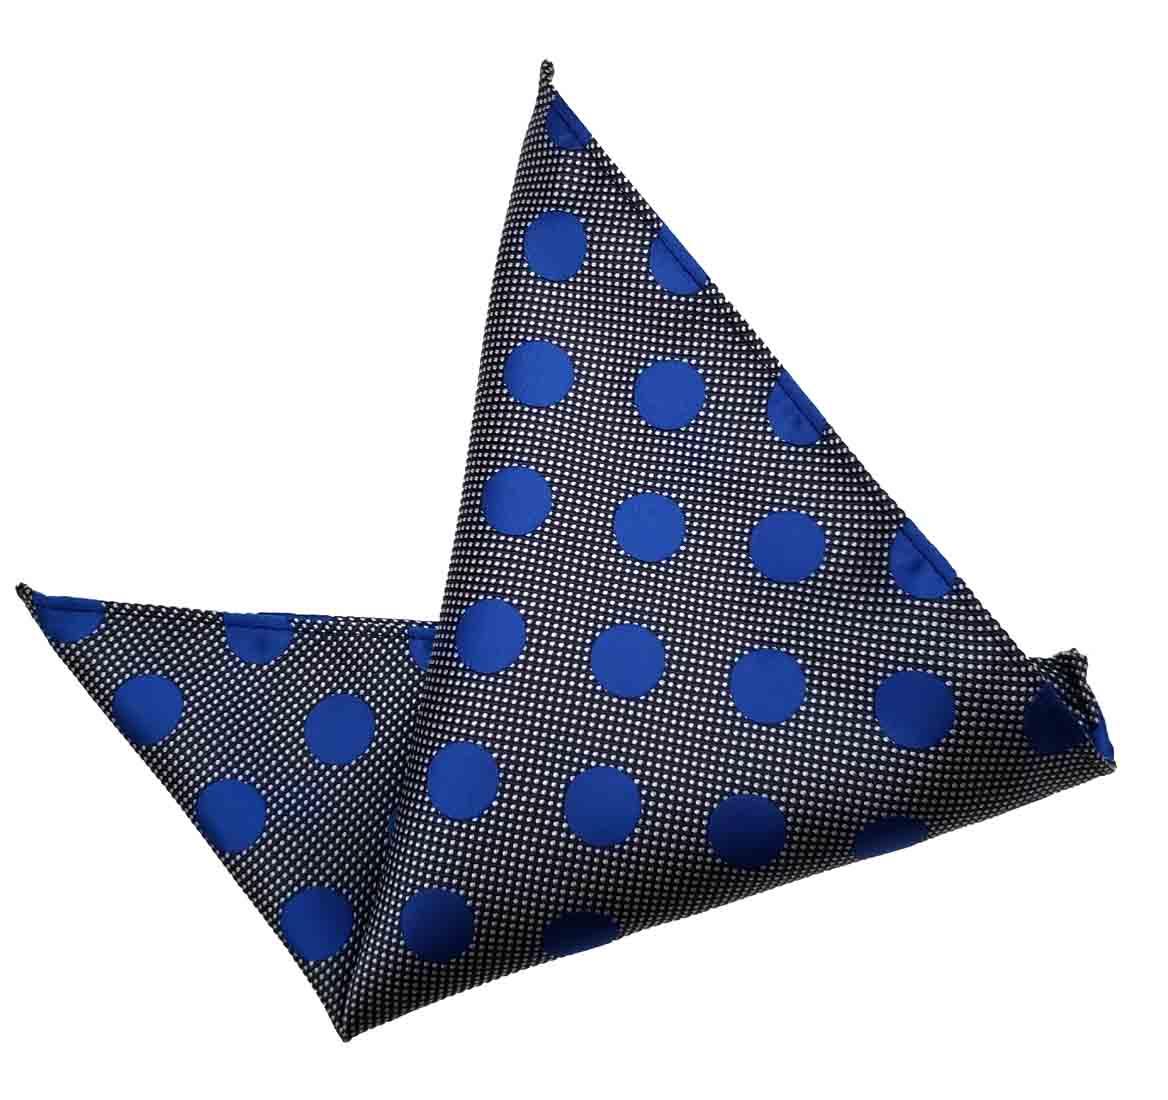 ekSel Pocket Square Blue Gray Polka Dot Men's